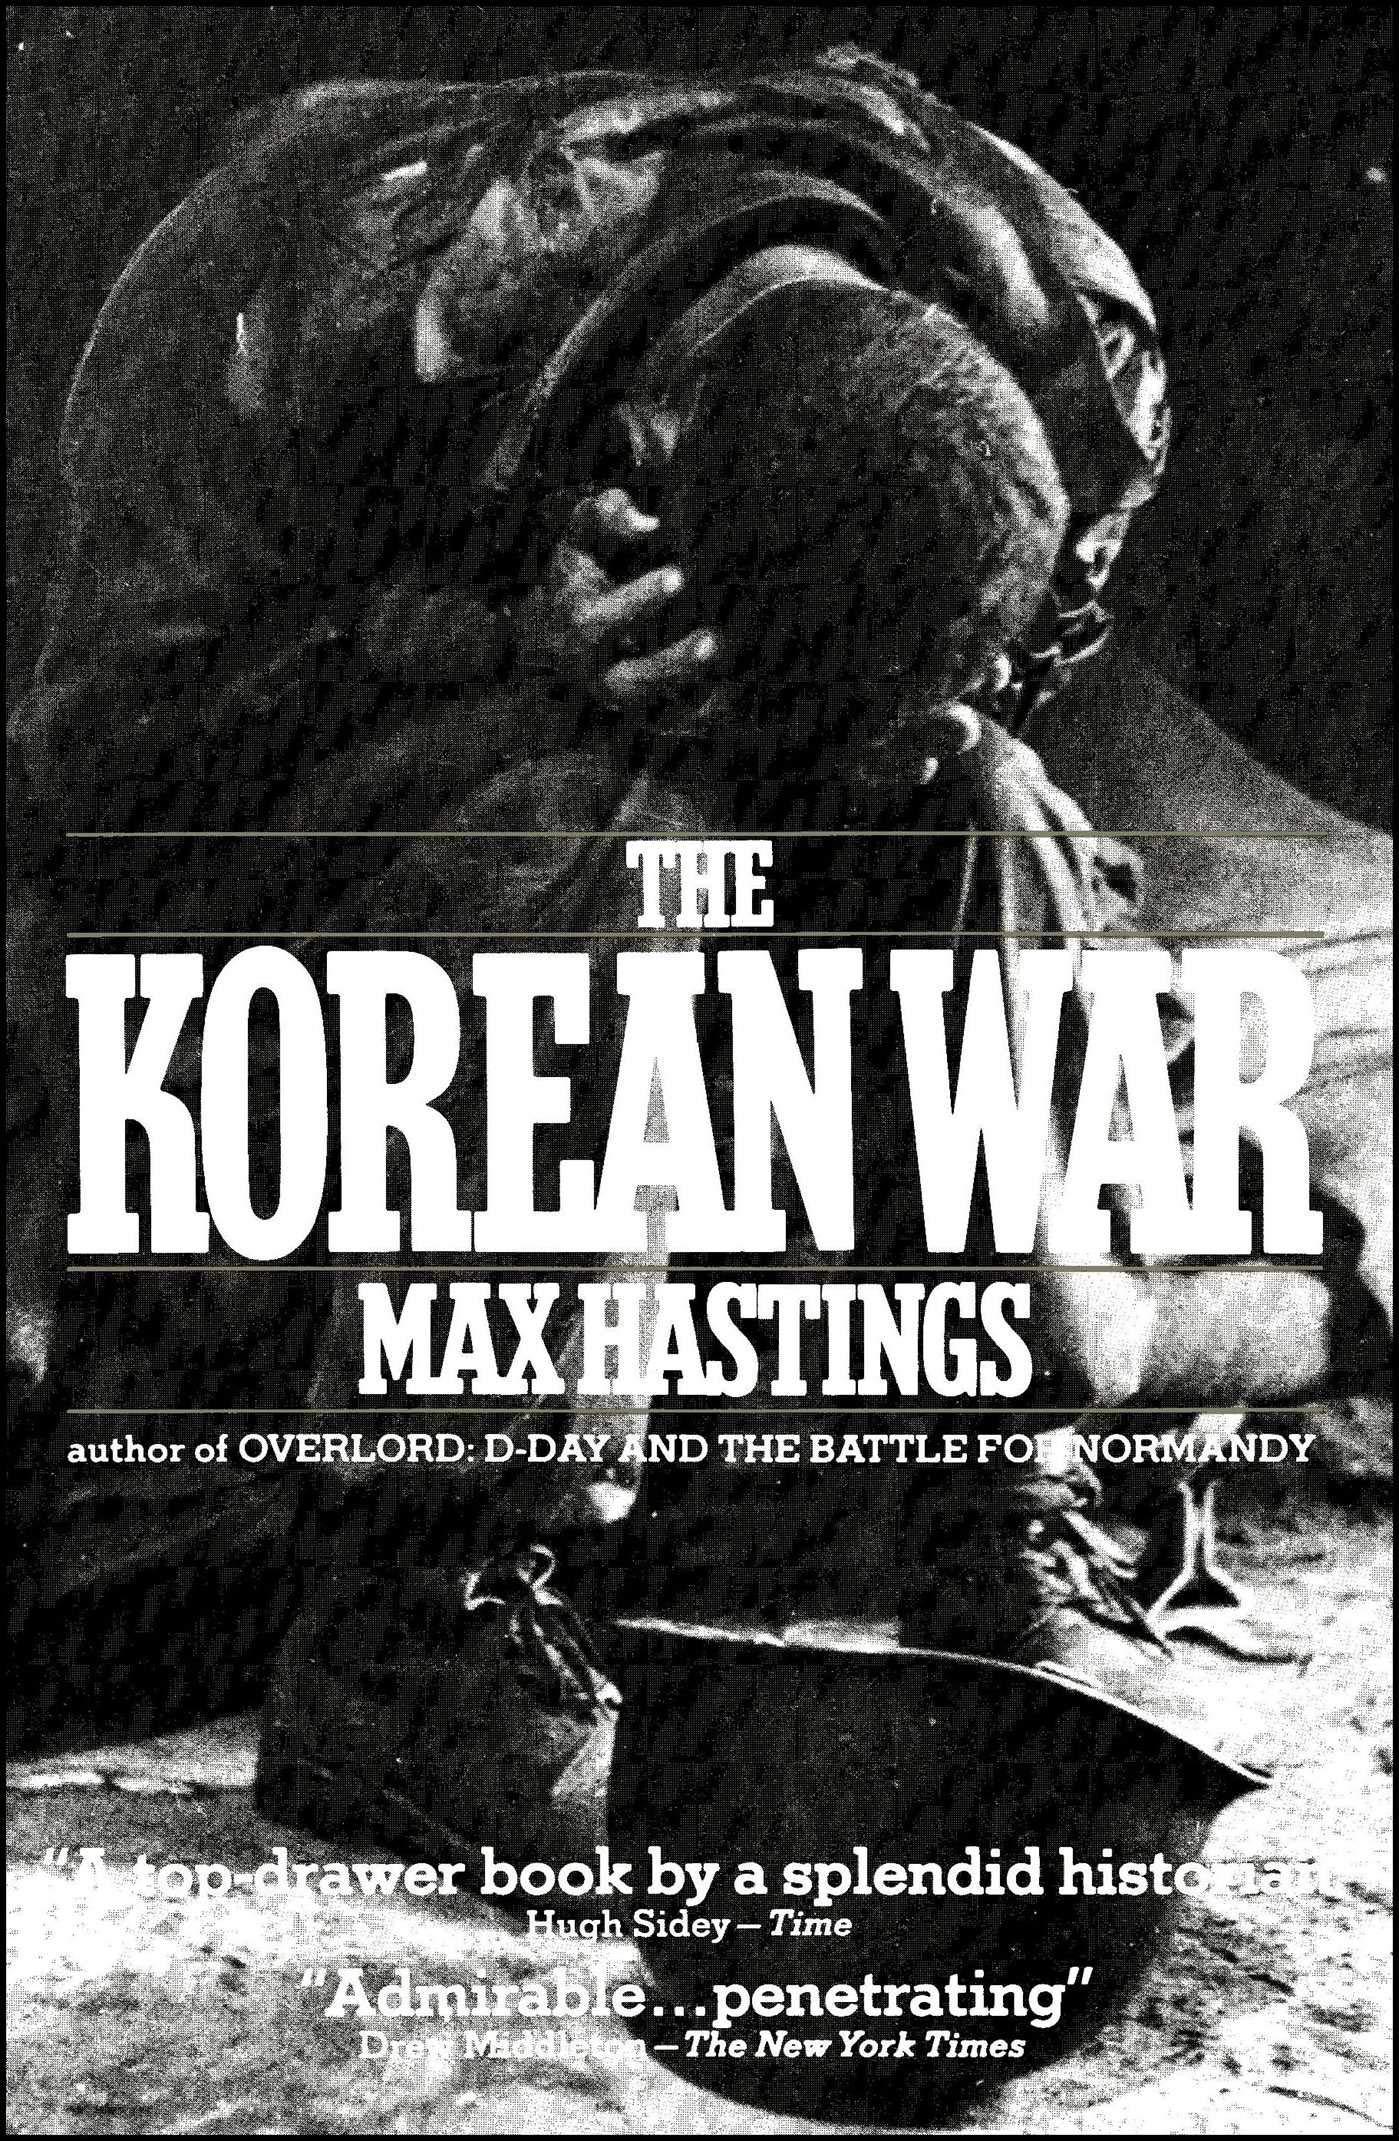 The Korean War: Hastings, Max: 9780671668341: Amazon.com: Books